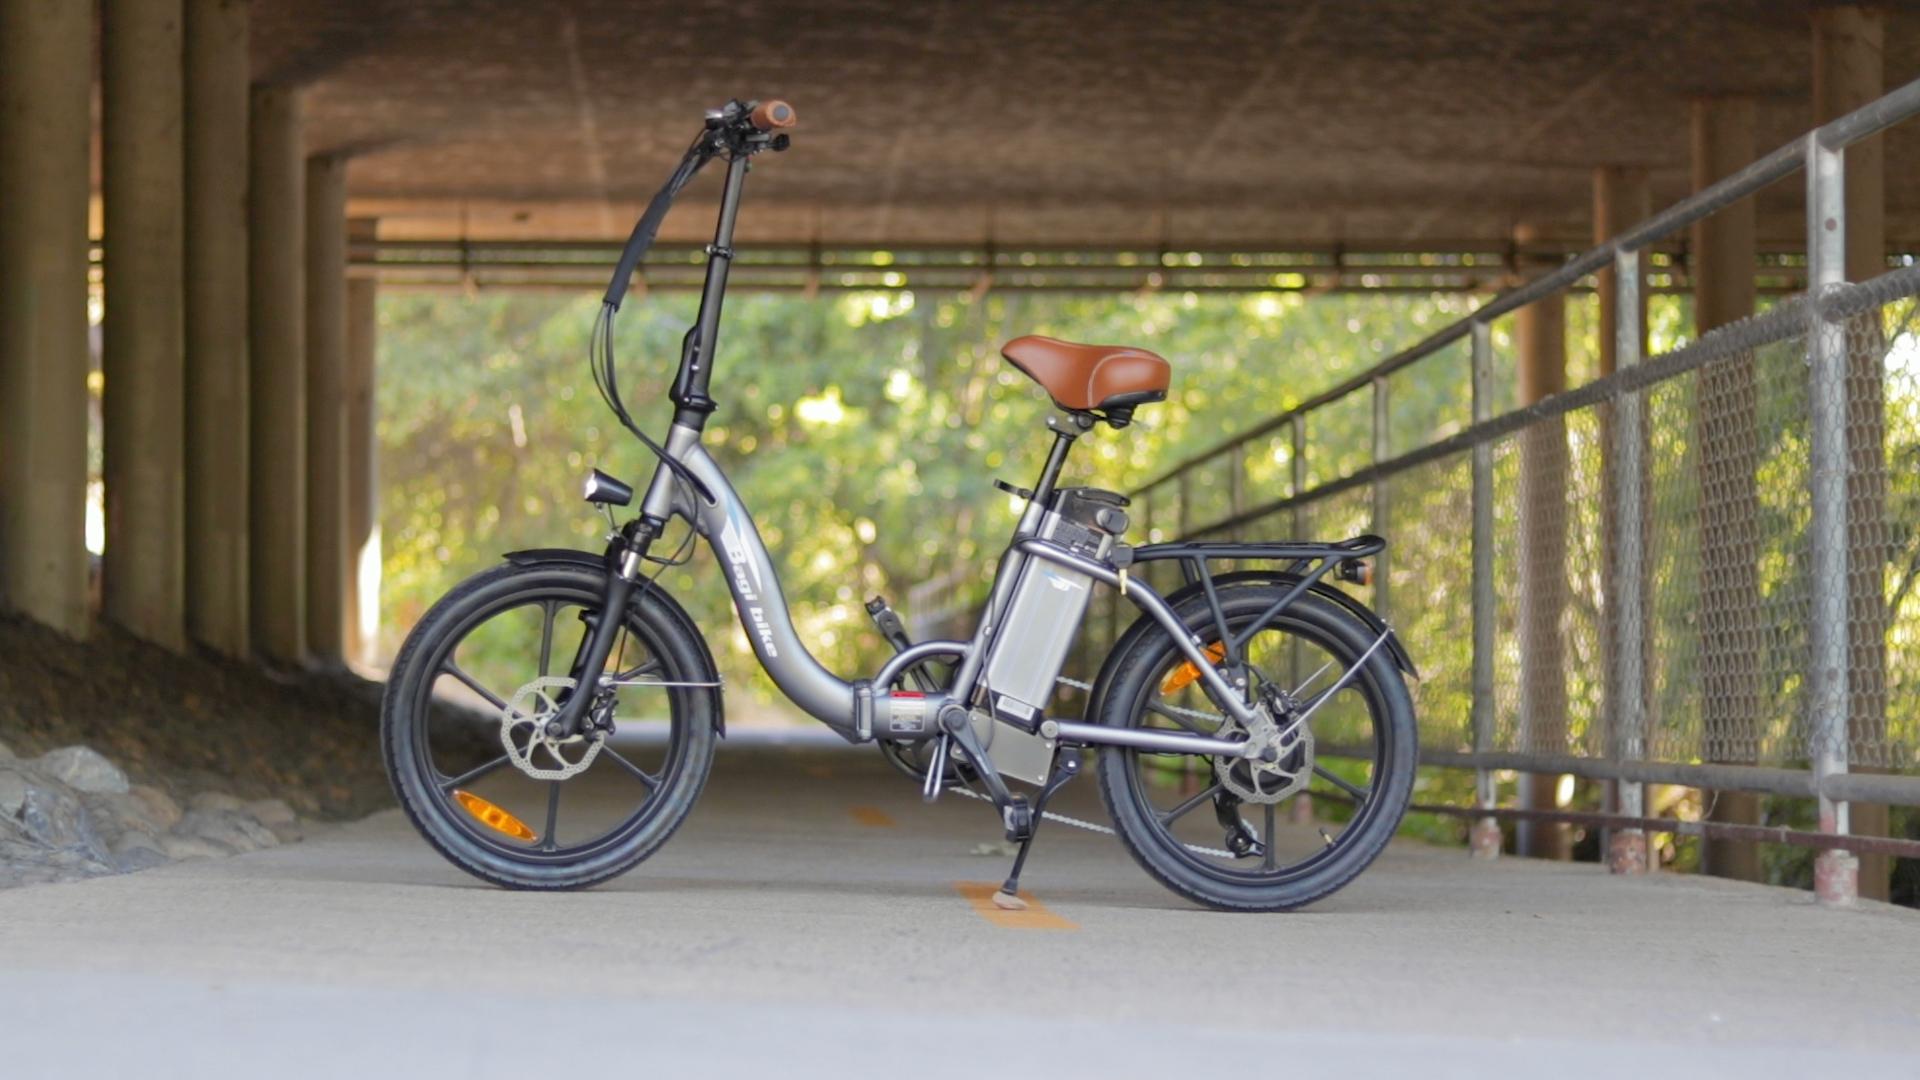 electrified-reviews-bagibike-b10-foldign-electric-bike-review-profile-4.jpg